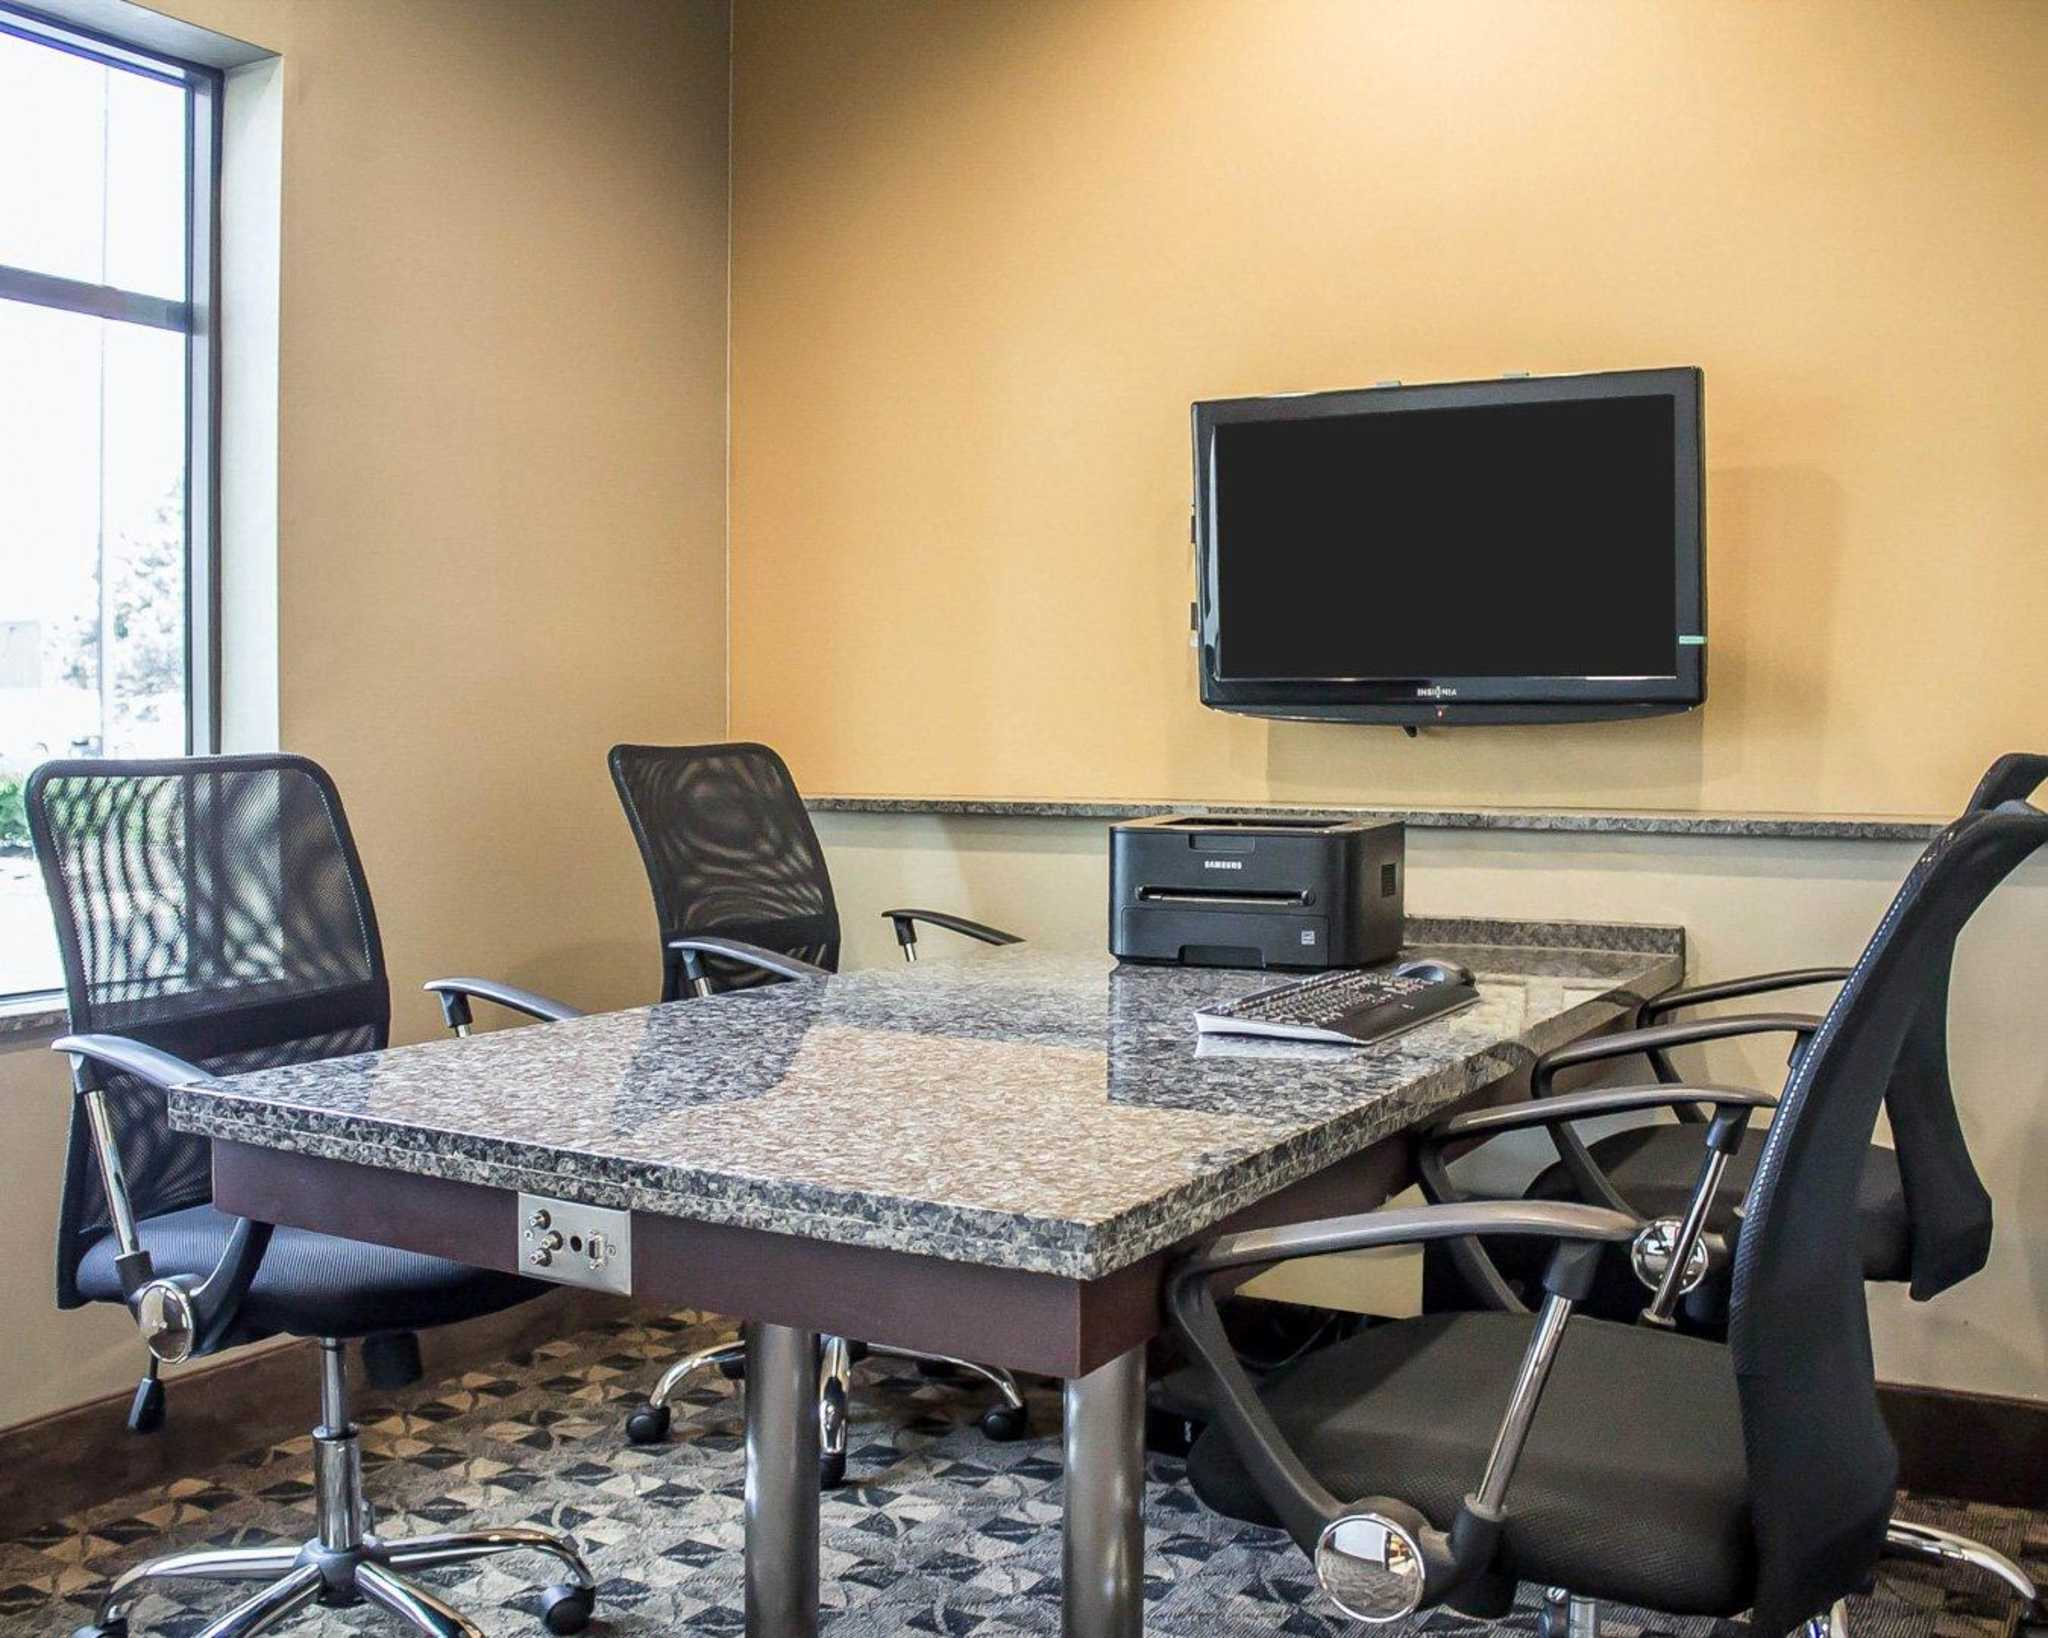 Comfort Suites Perrysburg - Toledo South image 10